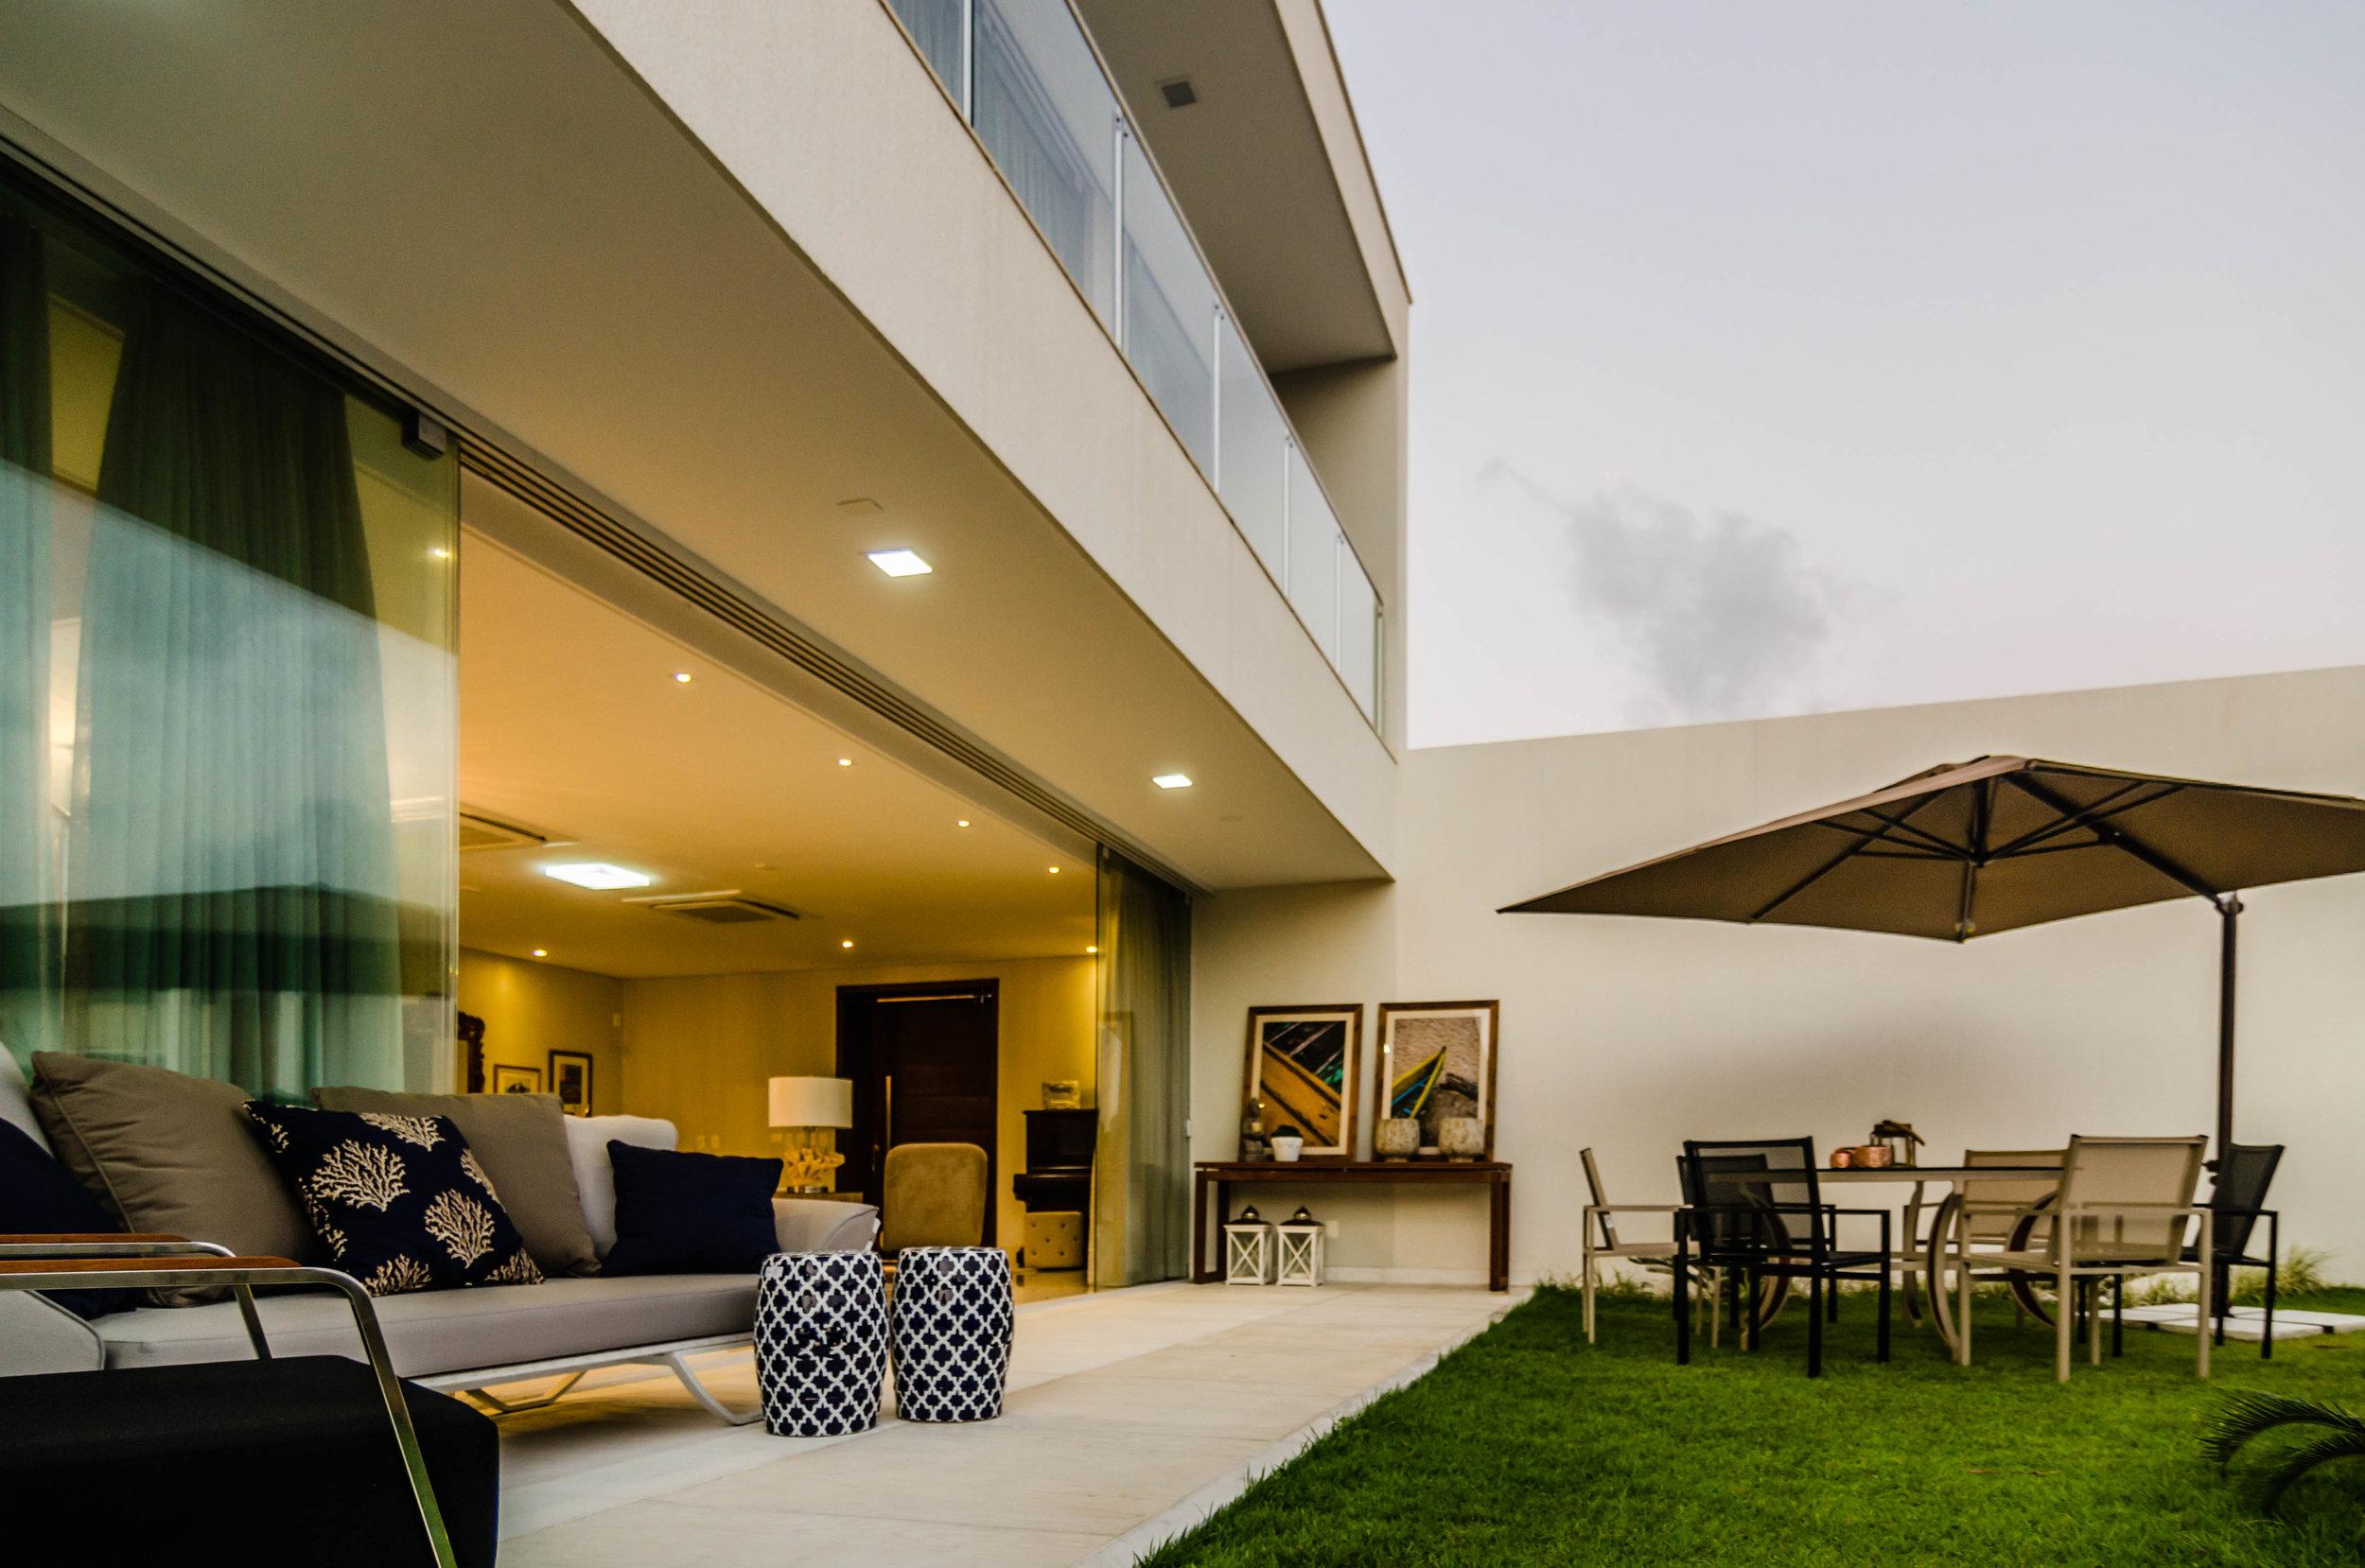 projeto-arquitetonico-edenio-duo-arquitetura-casa-01.jpg